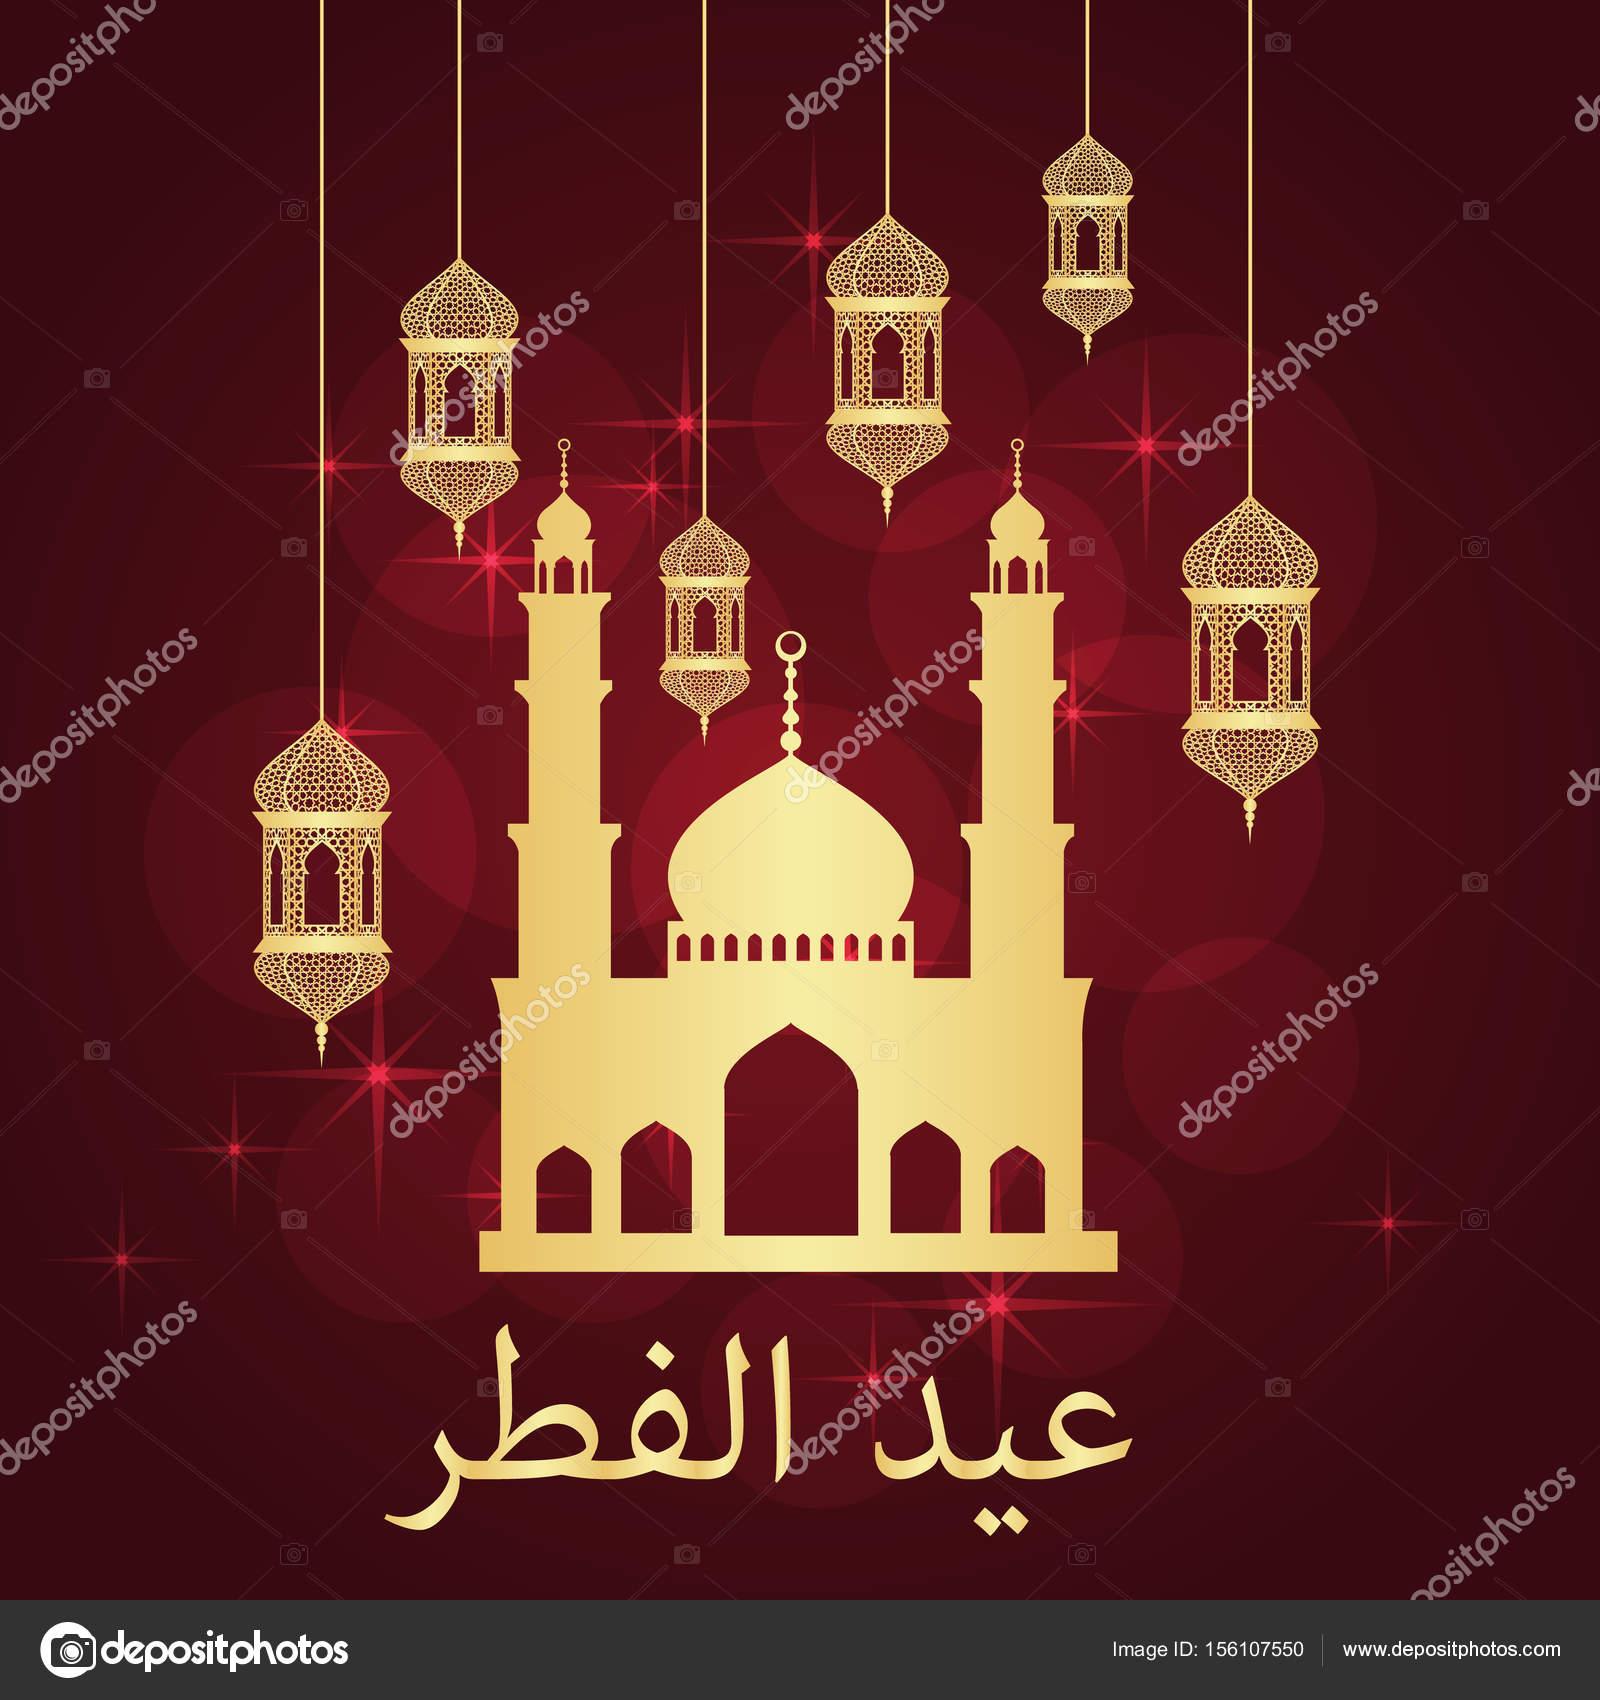 Wonderful Id Festival Eid Al-Fitr Greeting - depositphotos_156107550-stock-illustration-eid-al-fitr-greeting-card  Picture_739145 .jpg